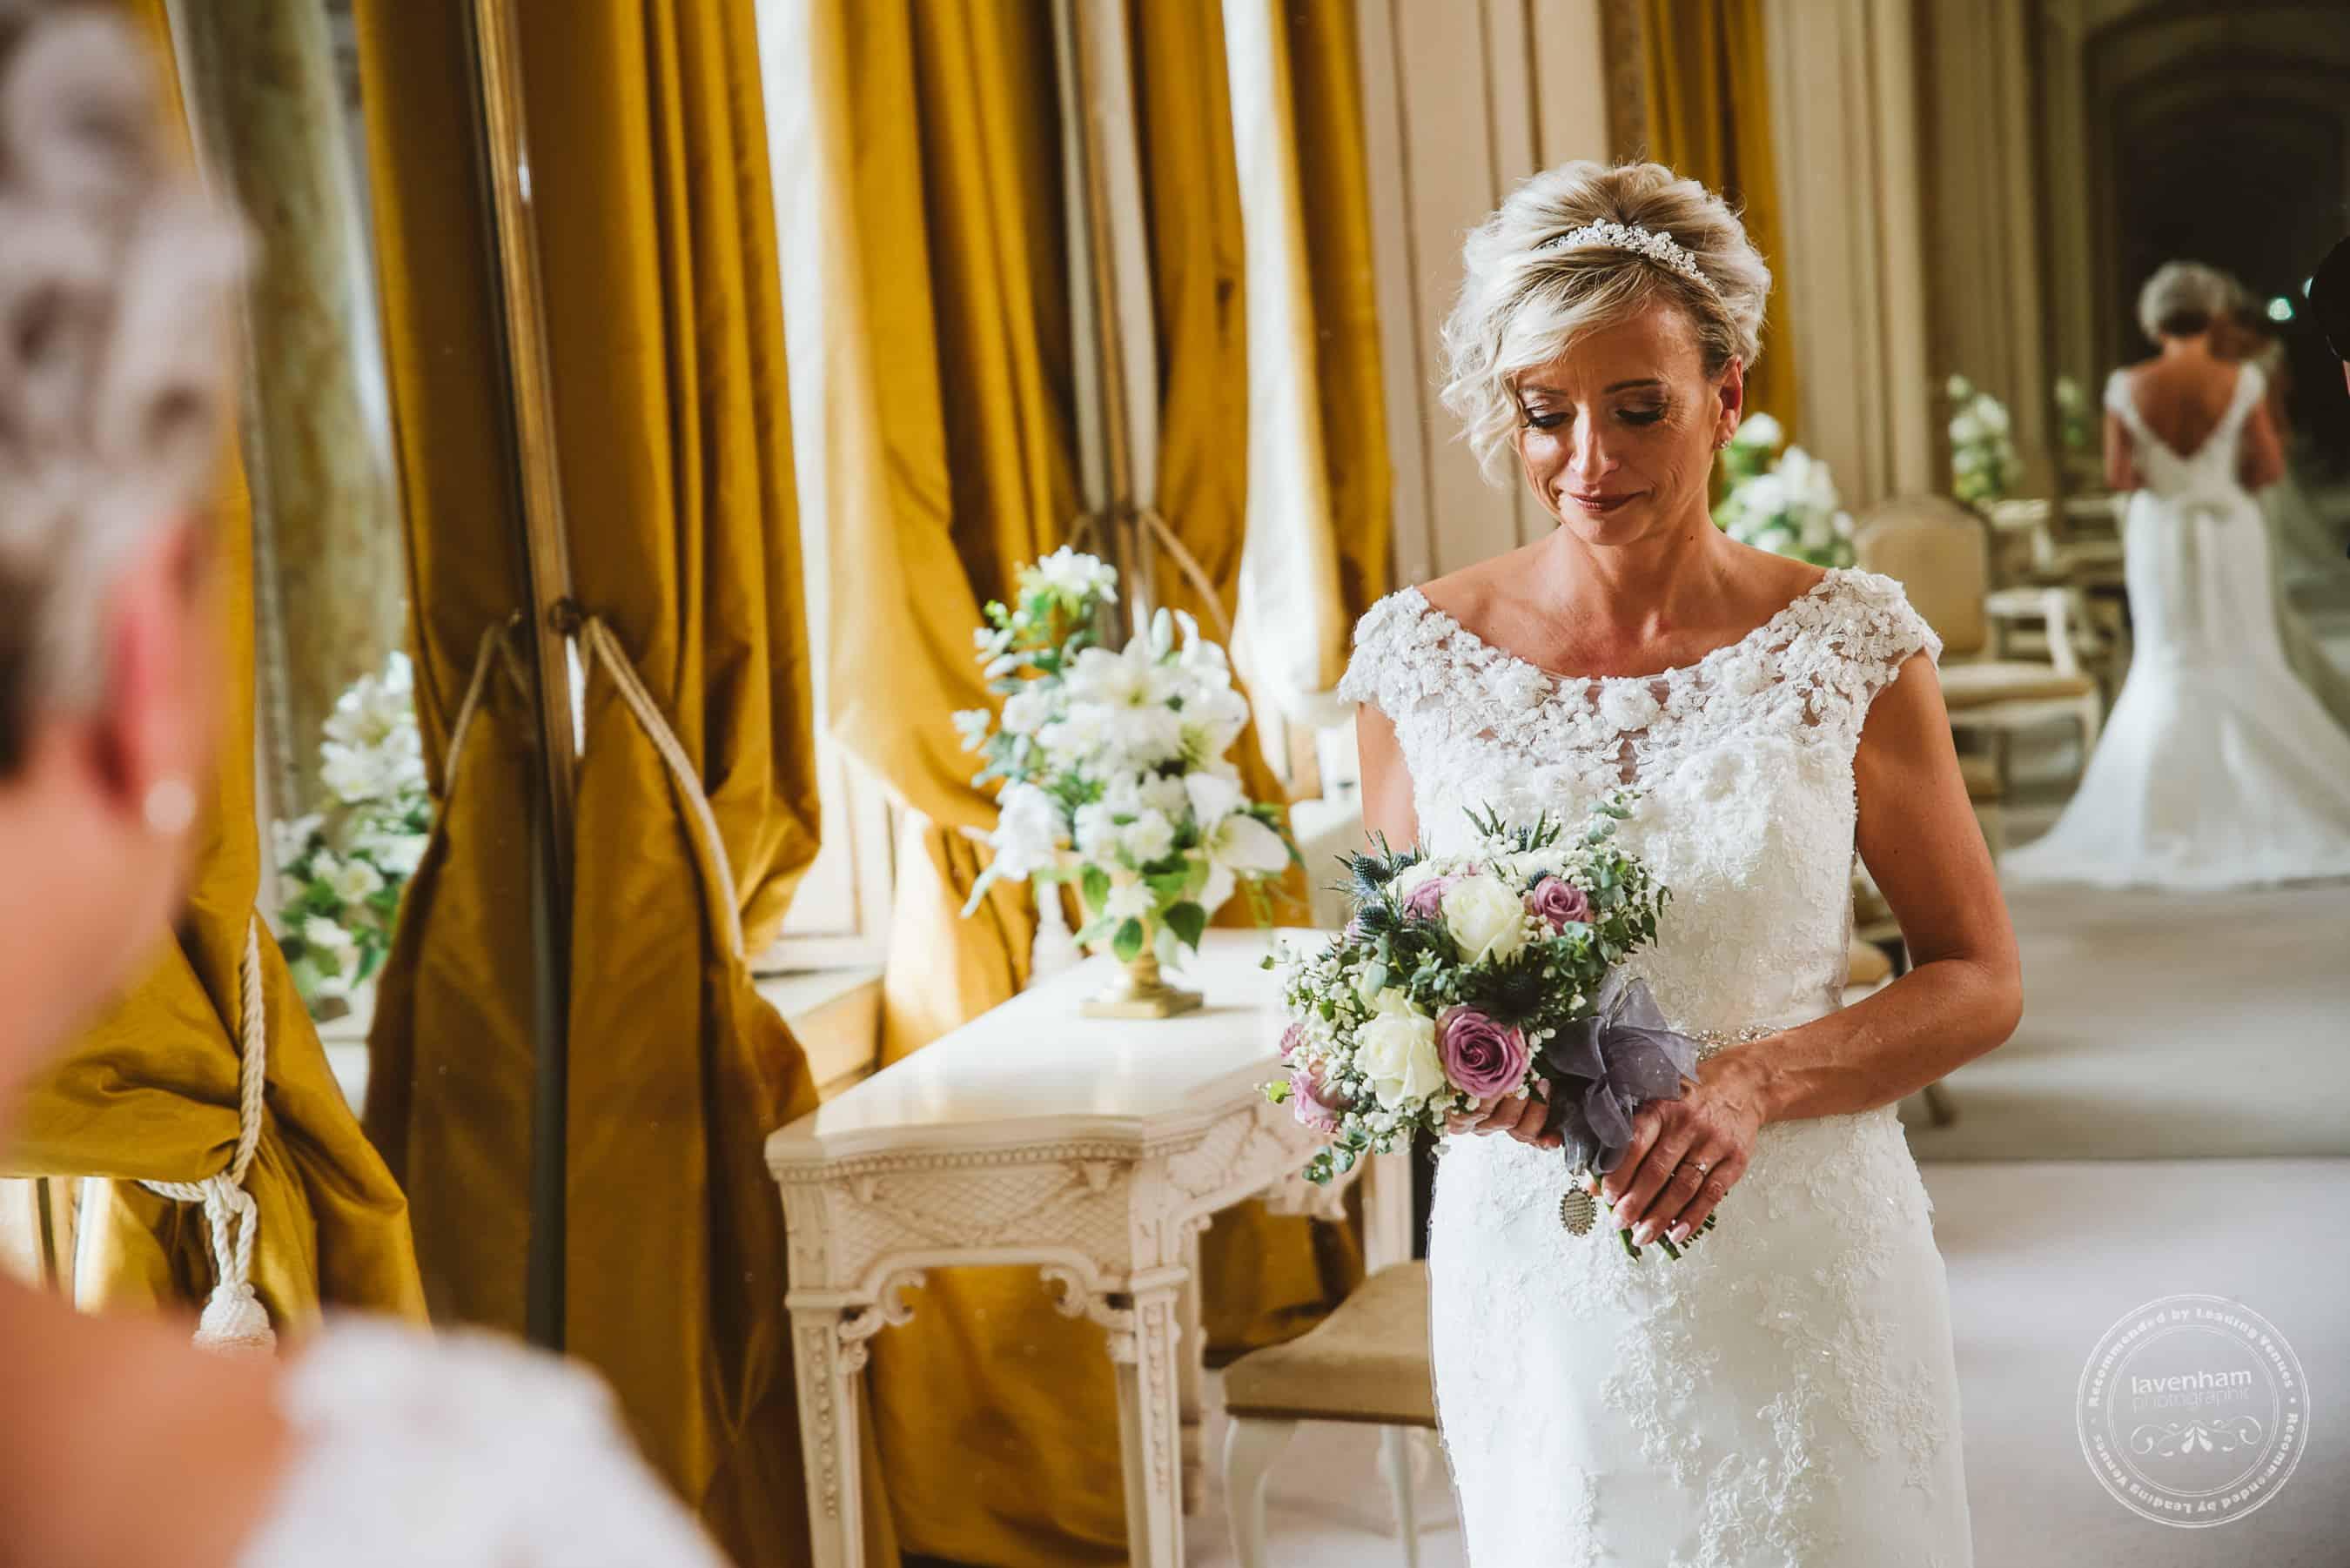 281018 Gosfield Hall Wedding Photography Lavenham Photographic 033